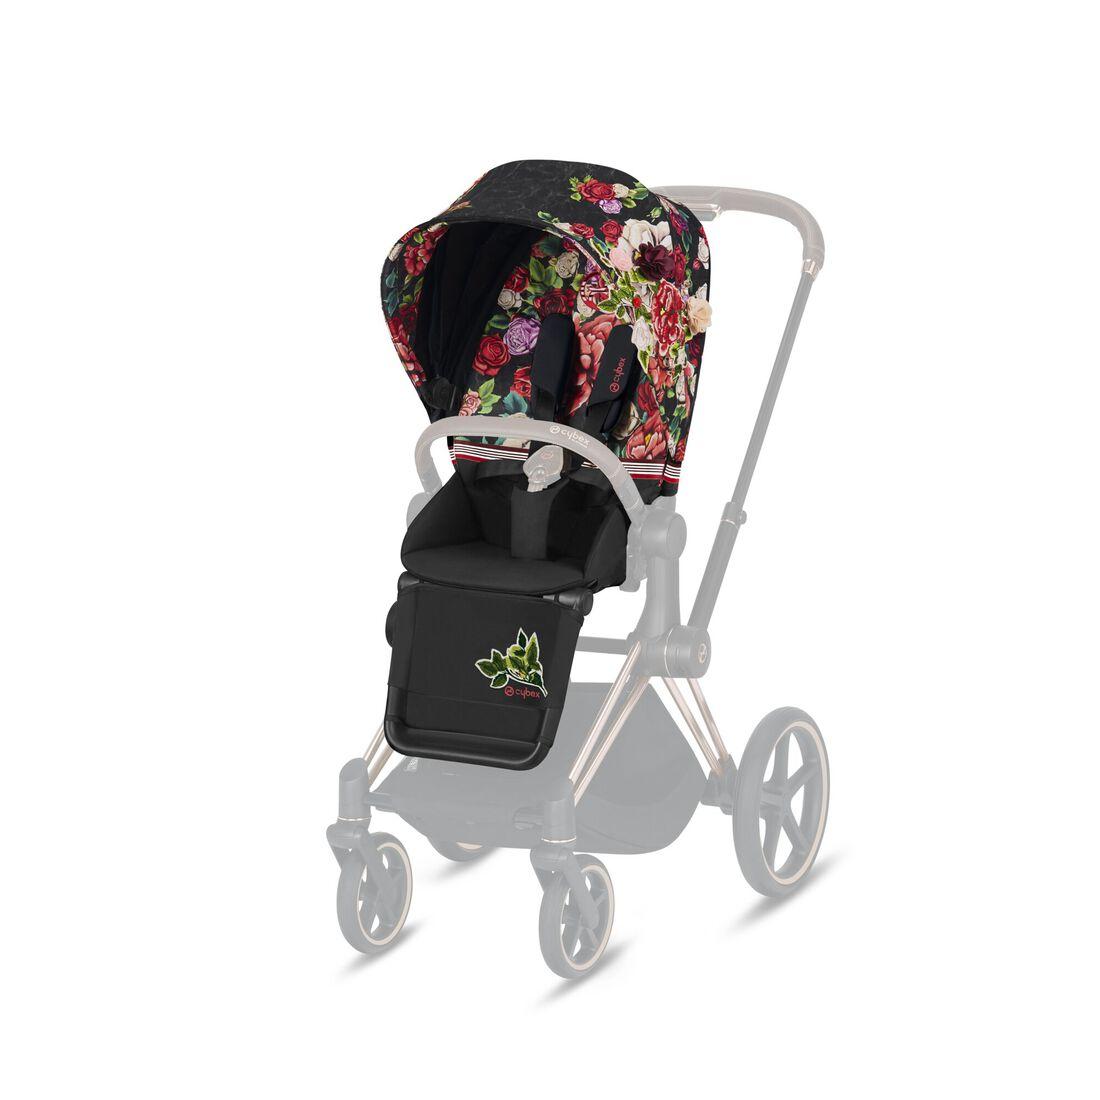 CYBEX Priam Seat Pack - Spring Blossom Dark in Spring Blossom Dark large image number 1